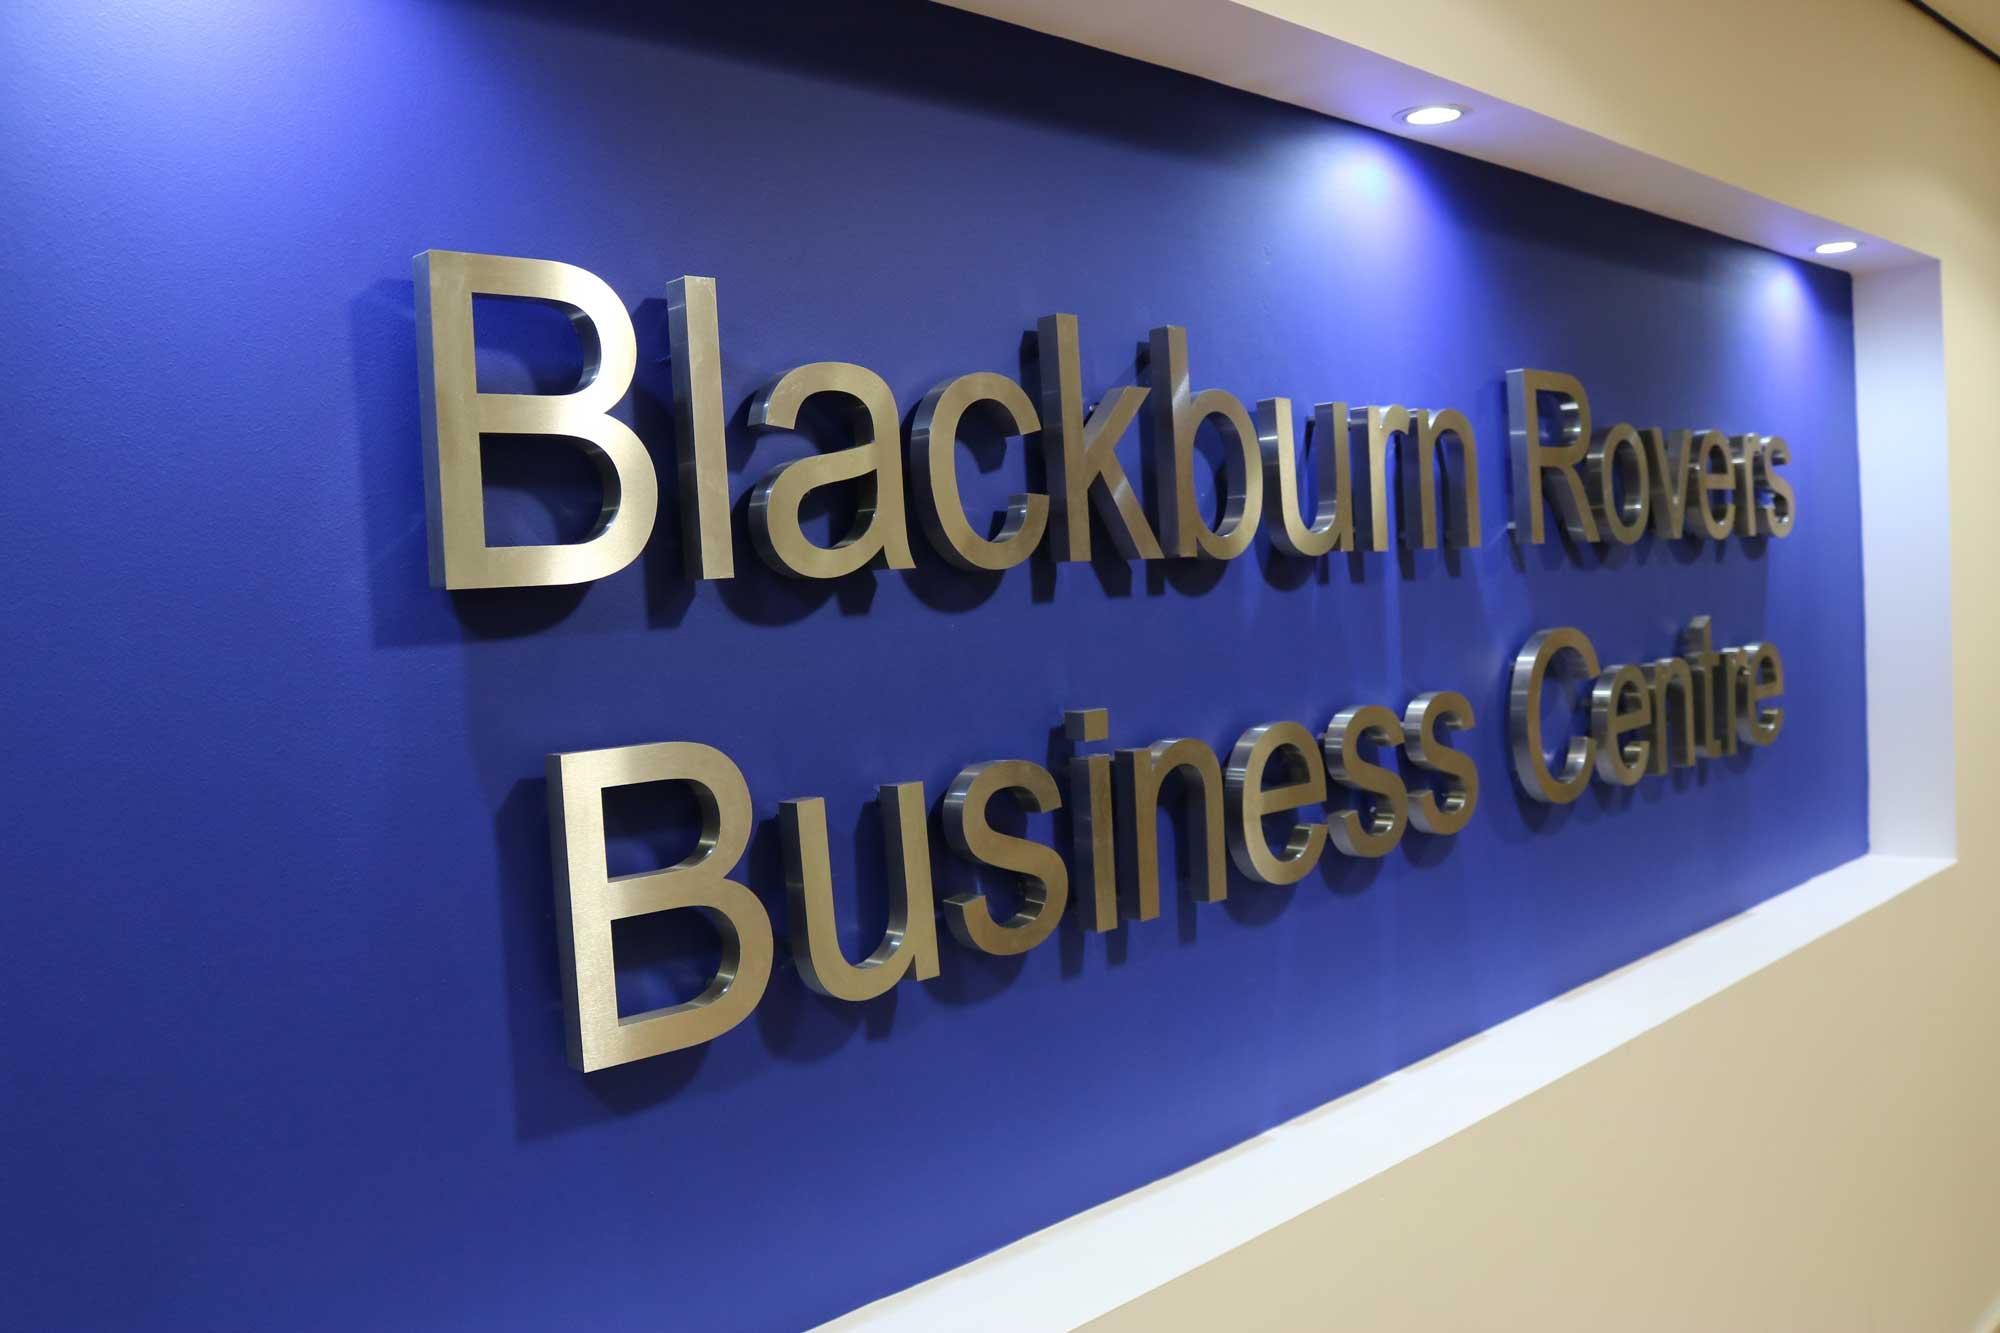 Blackburn Rovers Business Centre